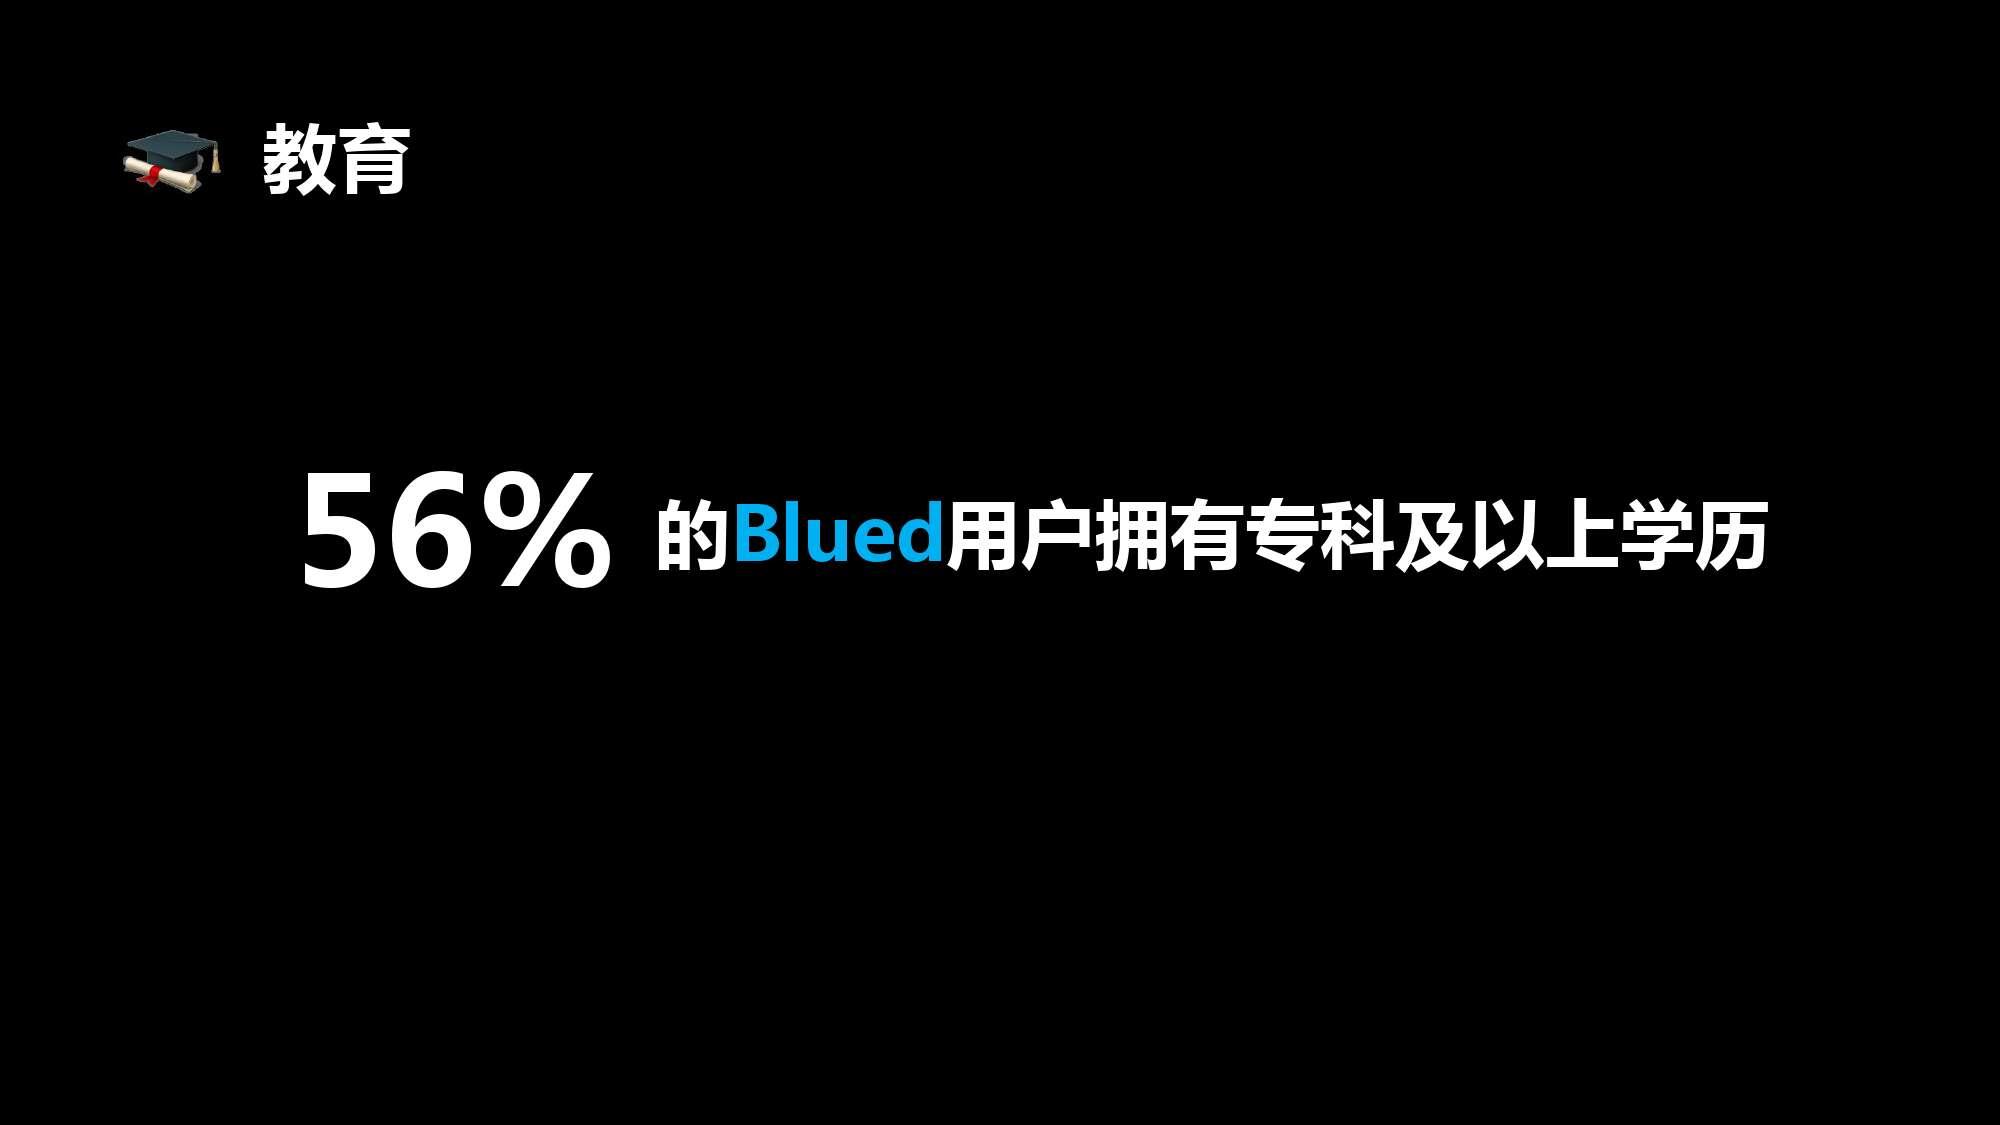 Blued2015中国同志社群大数据白皮书_000014